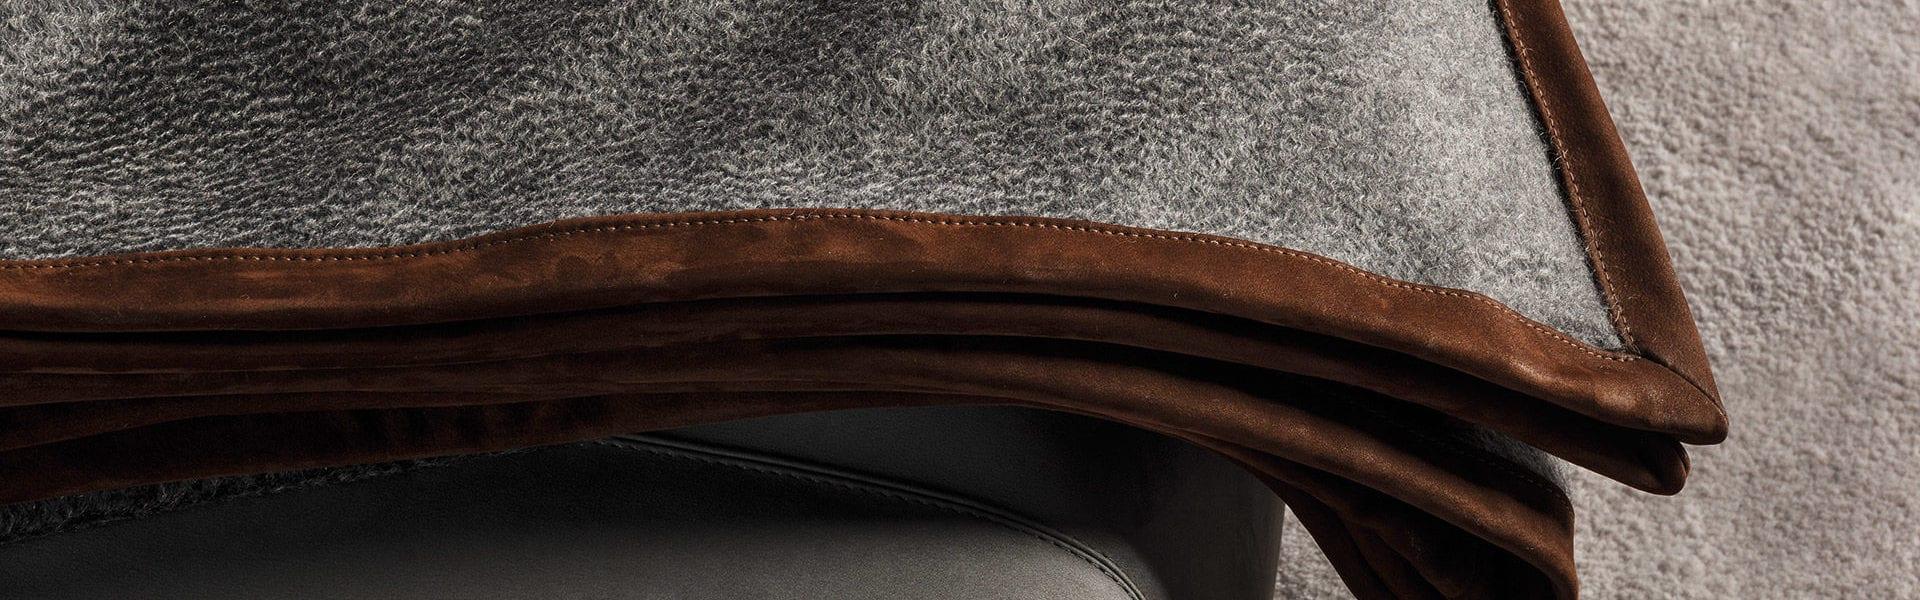 Creed 'Bedwear'